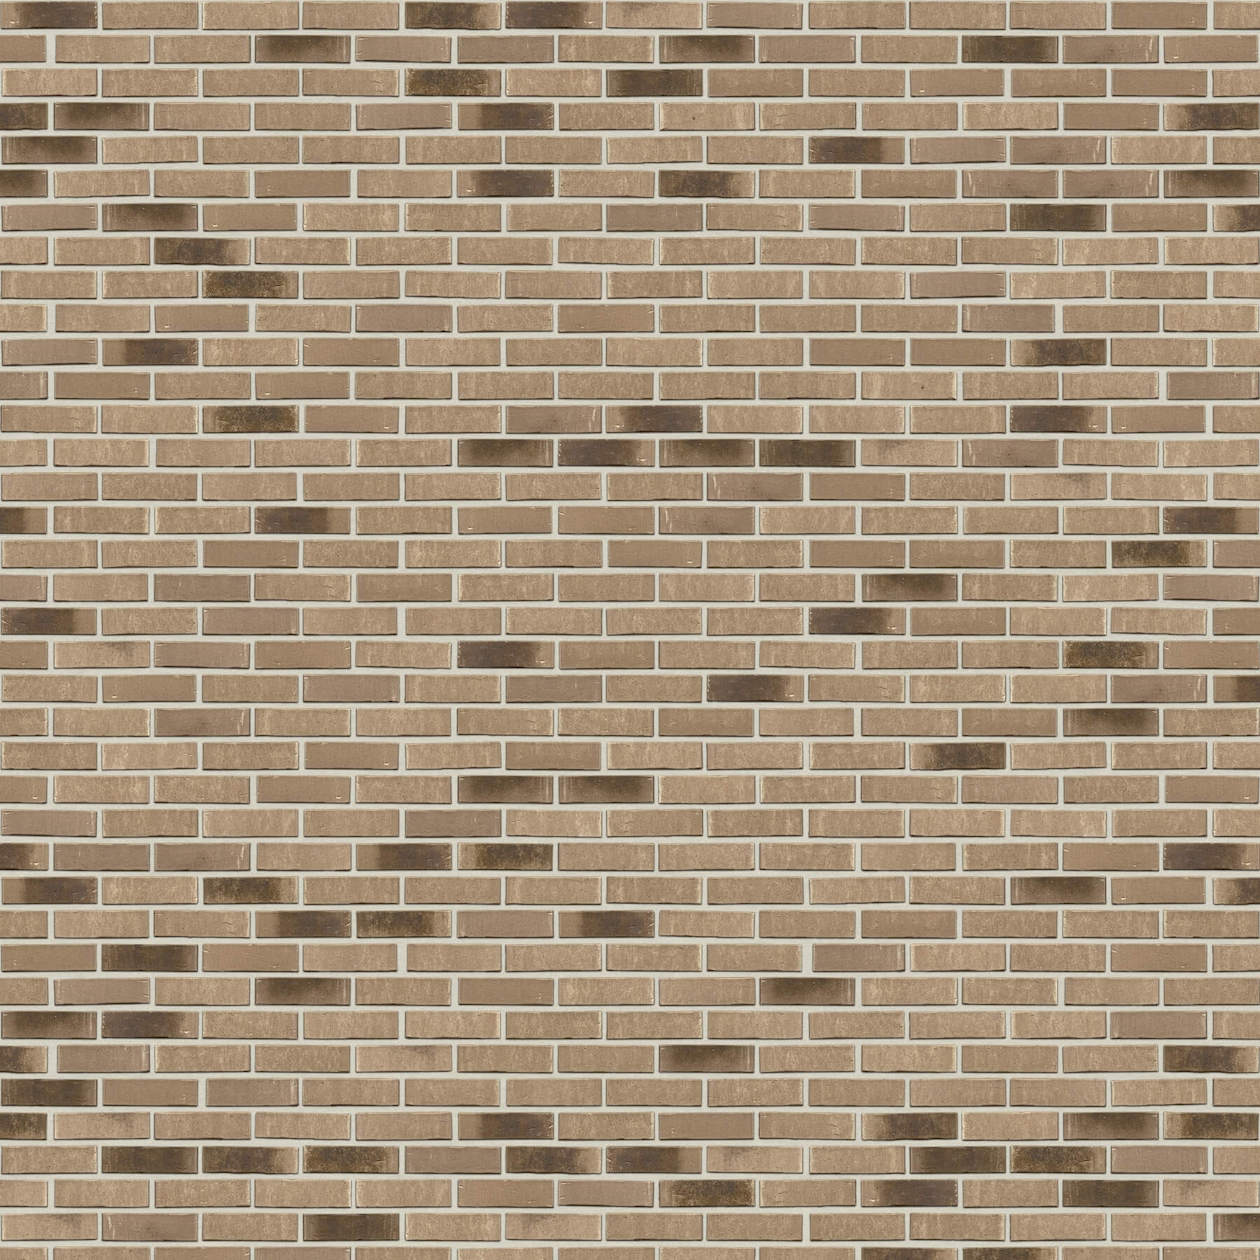 Puna-cigla-FeldHaus-Klinker-brick-house-nf-k-764-Bela Fuga